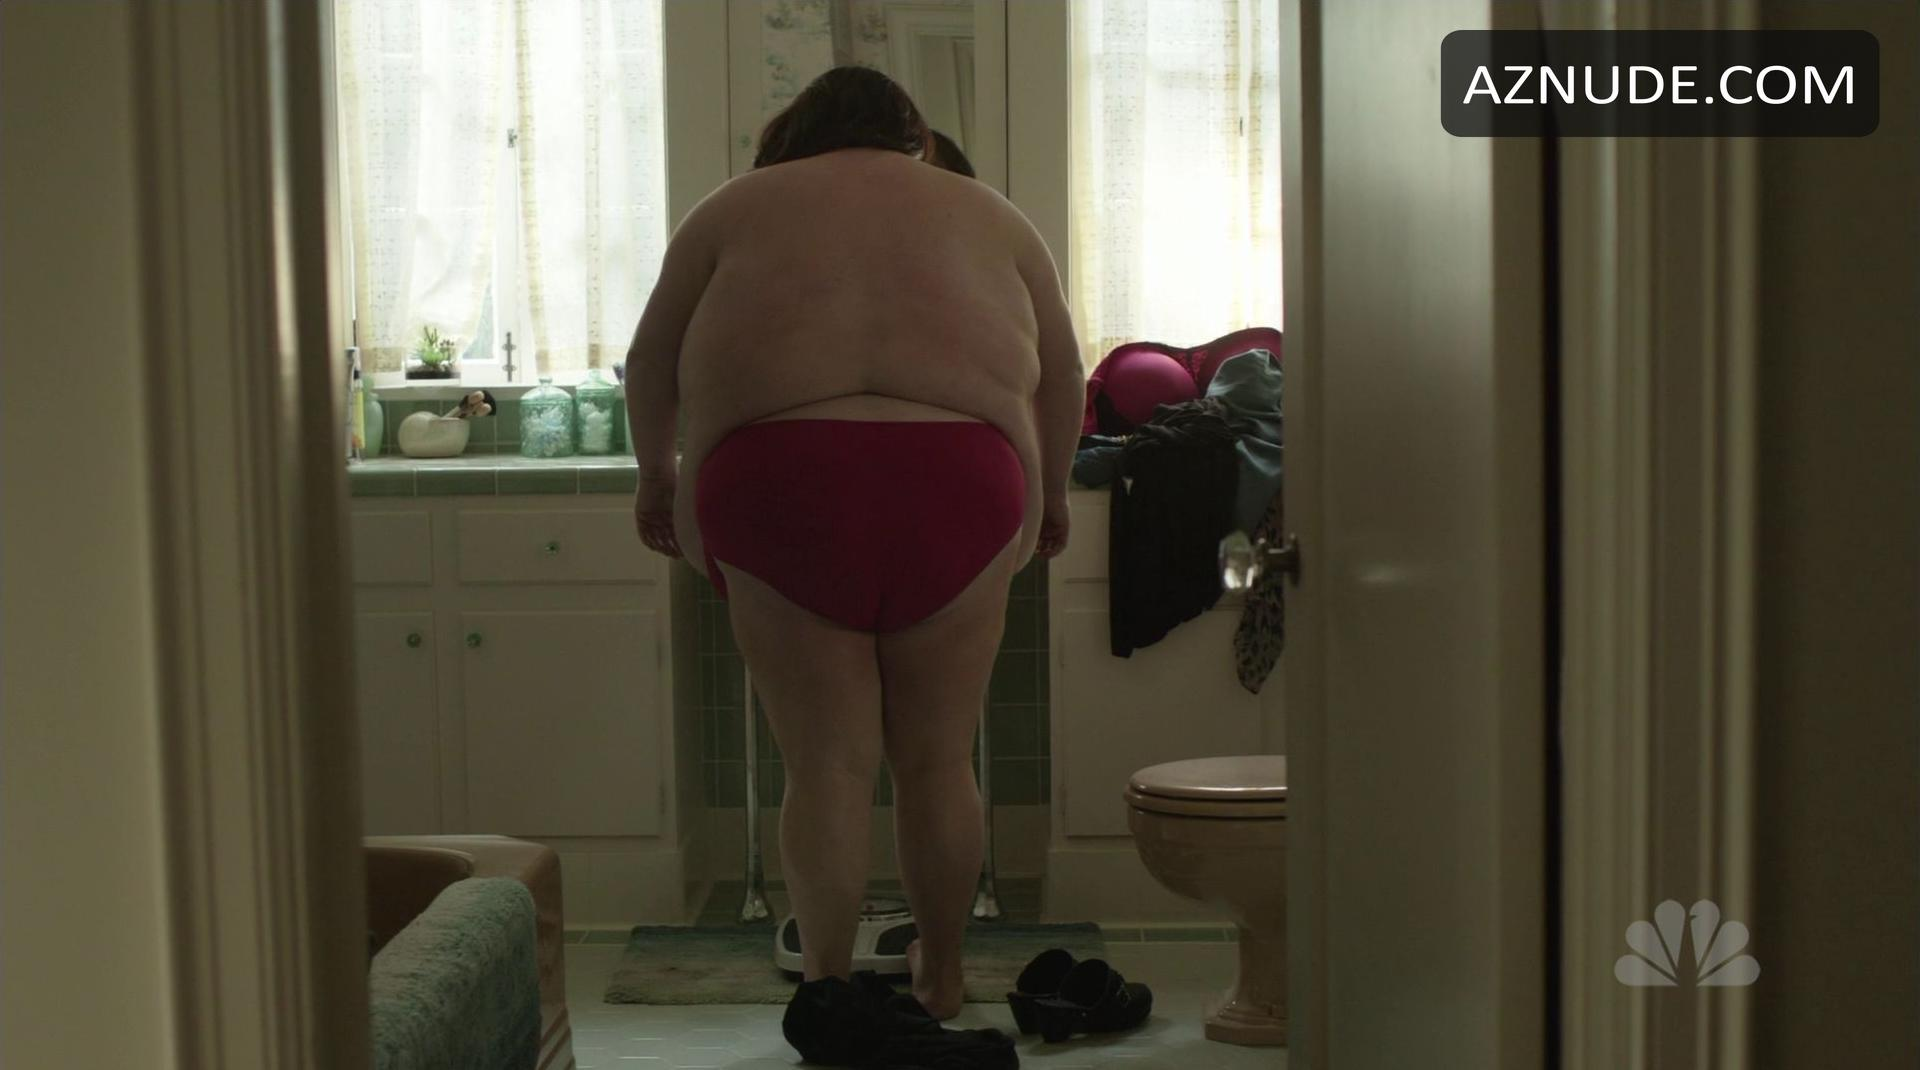 Kristen Stewart Amateur Blowjob Leaked Sex Tape  Pornhub